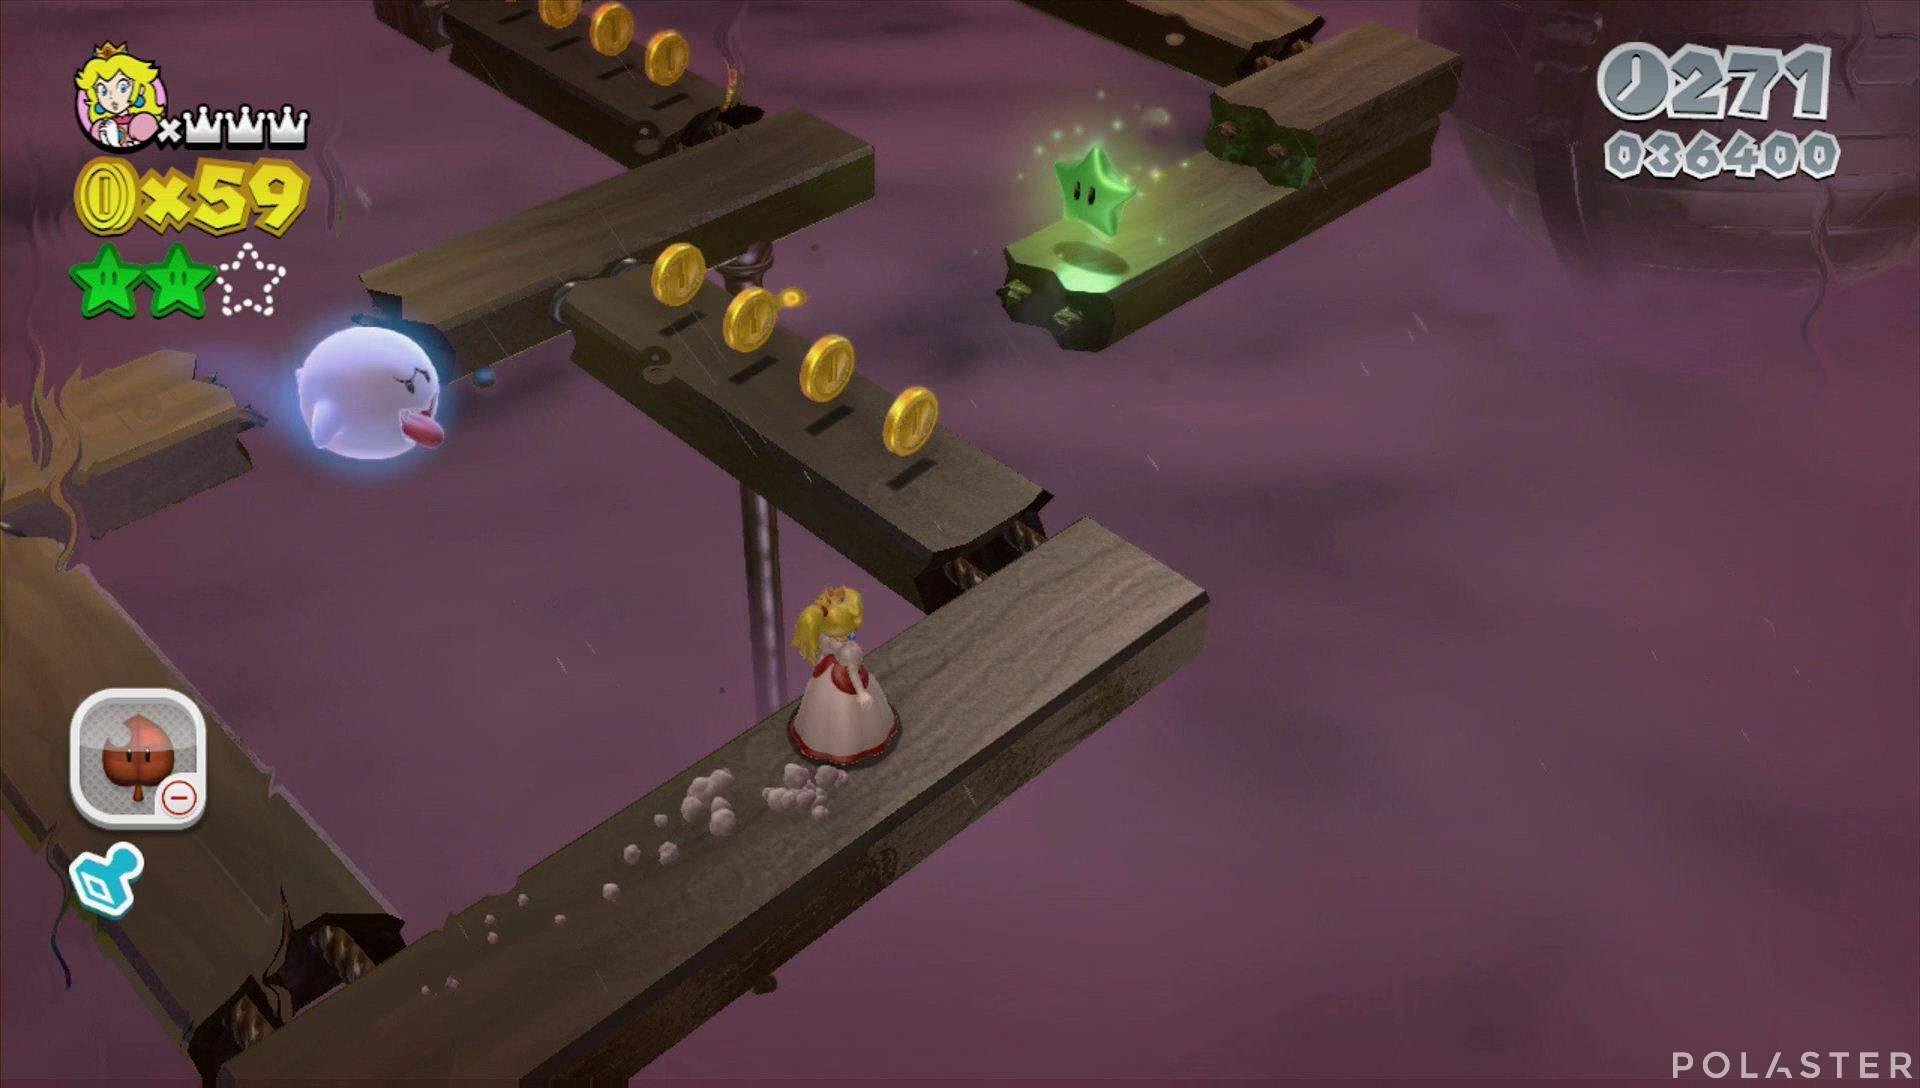 Super Mario 3D World Mundo 6-2 Estrella 3